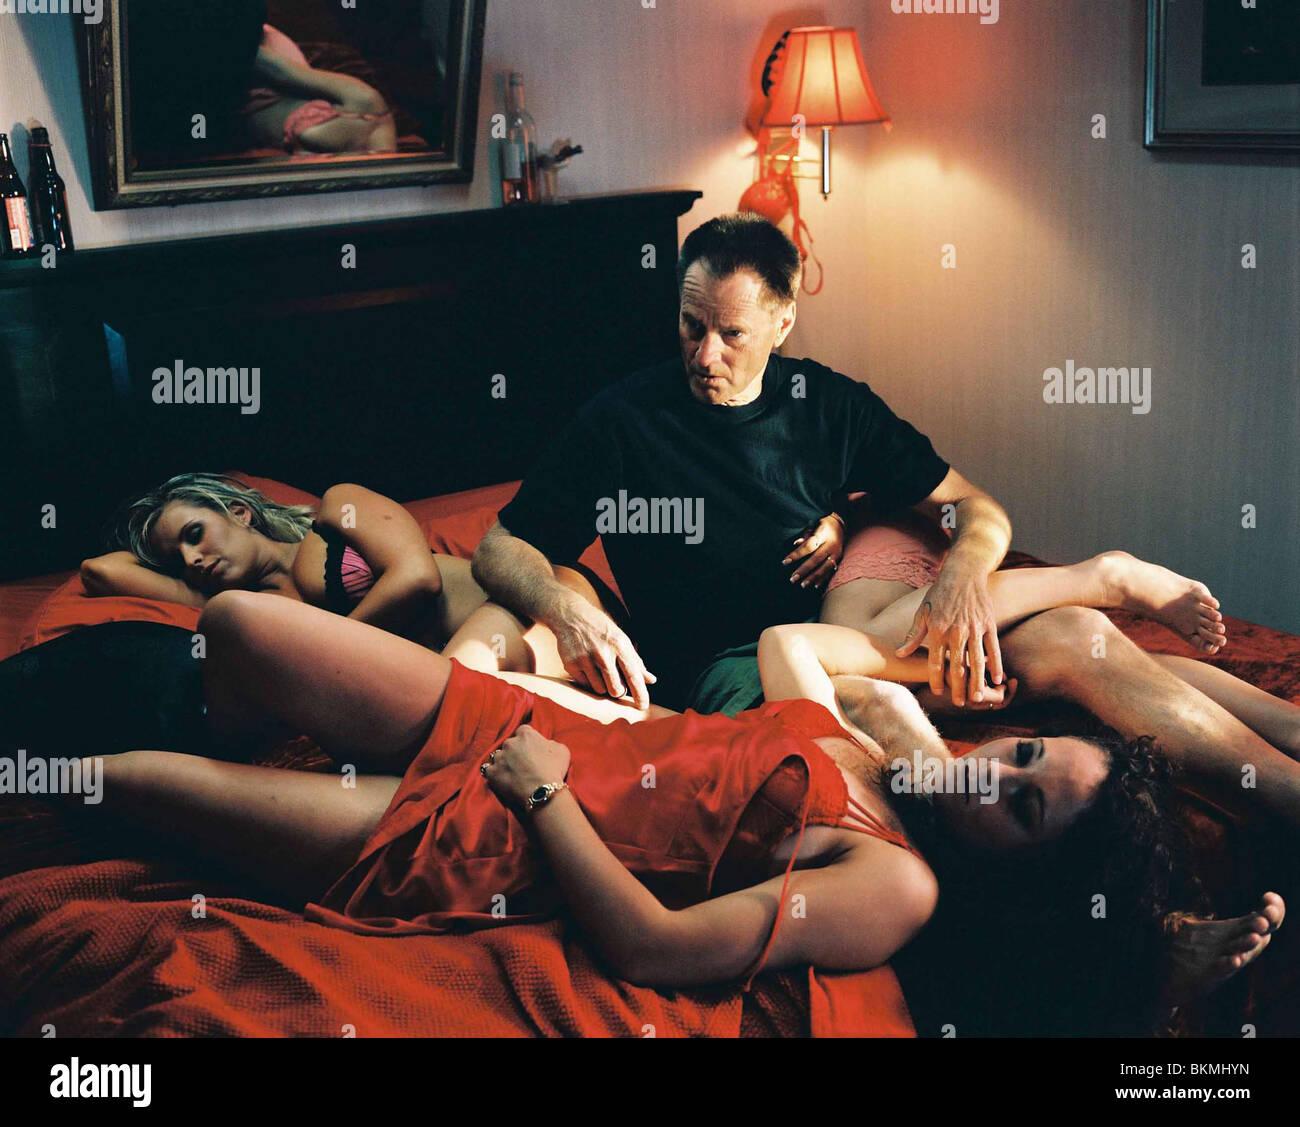 DON'T COME KNOCKING (2005) SAM SHEPARD DCMK 001-03 - Stock Image